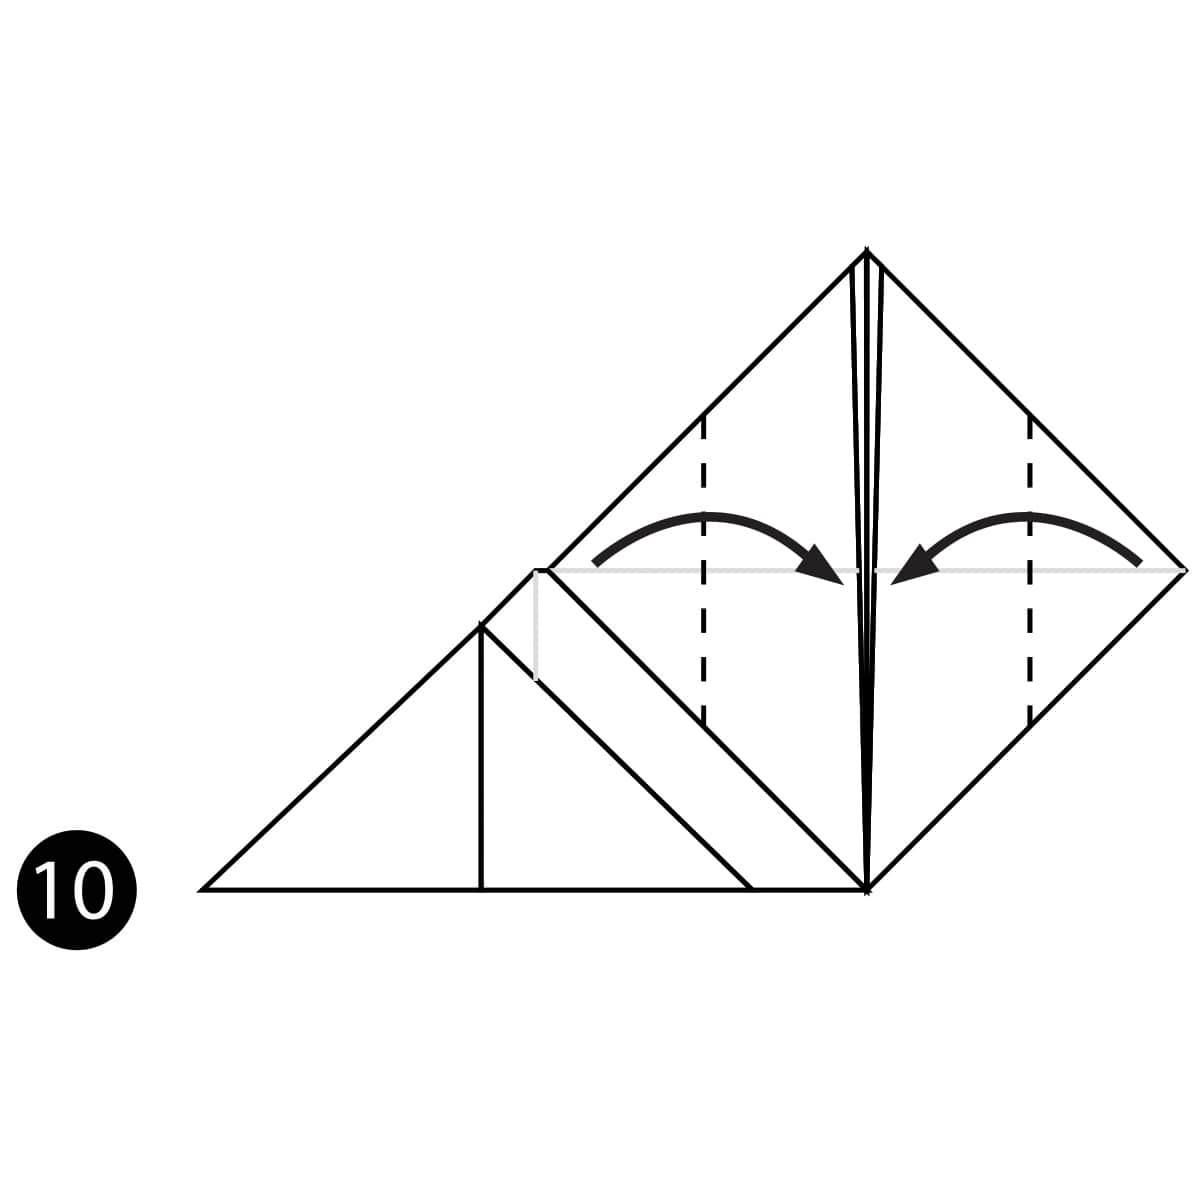 Goat Step 10